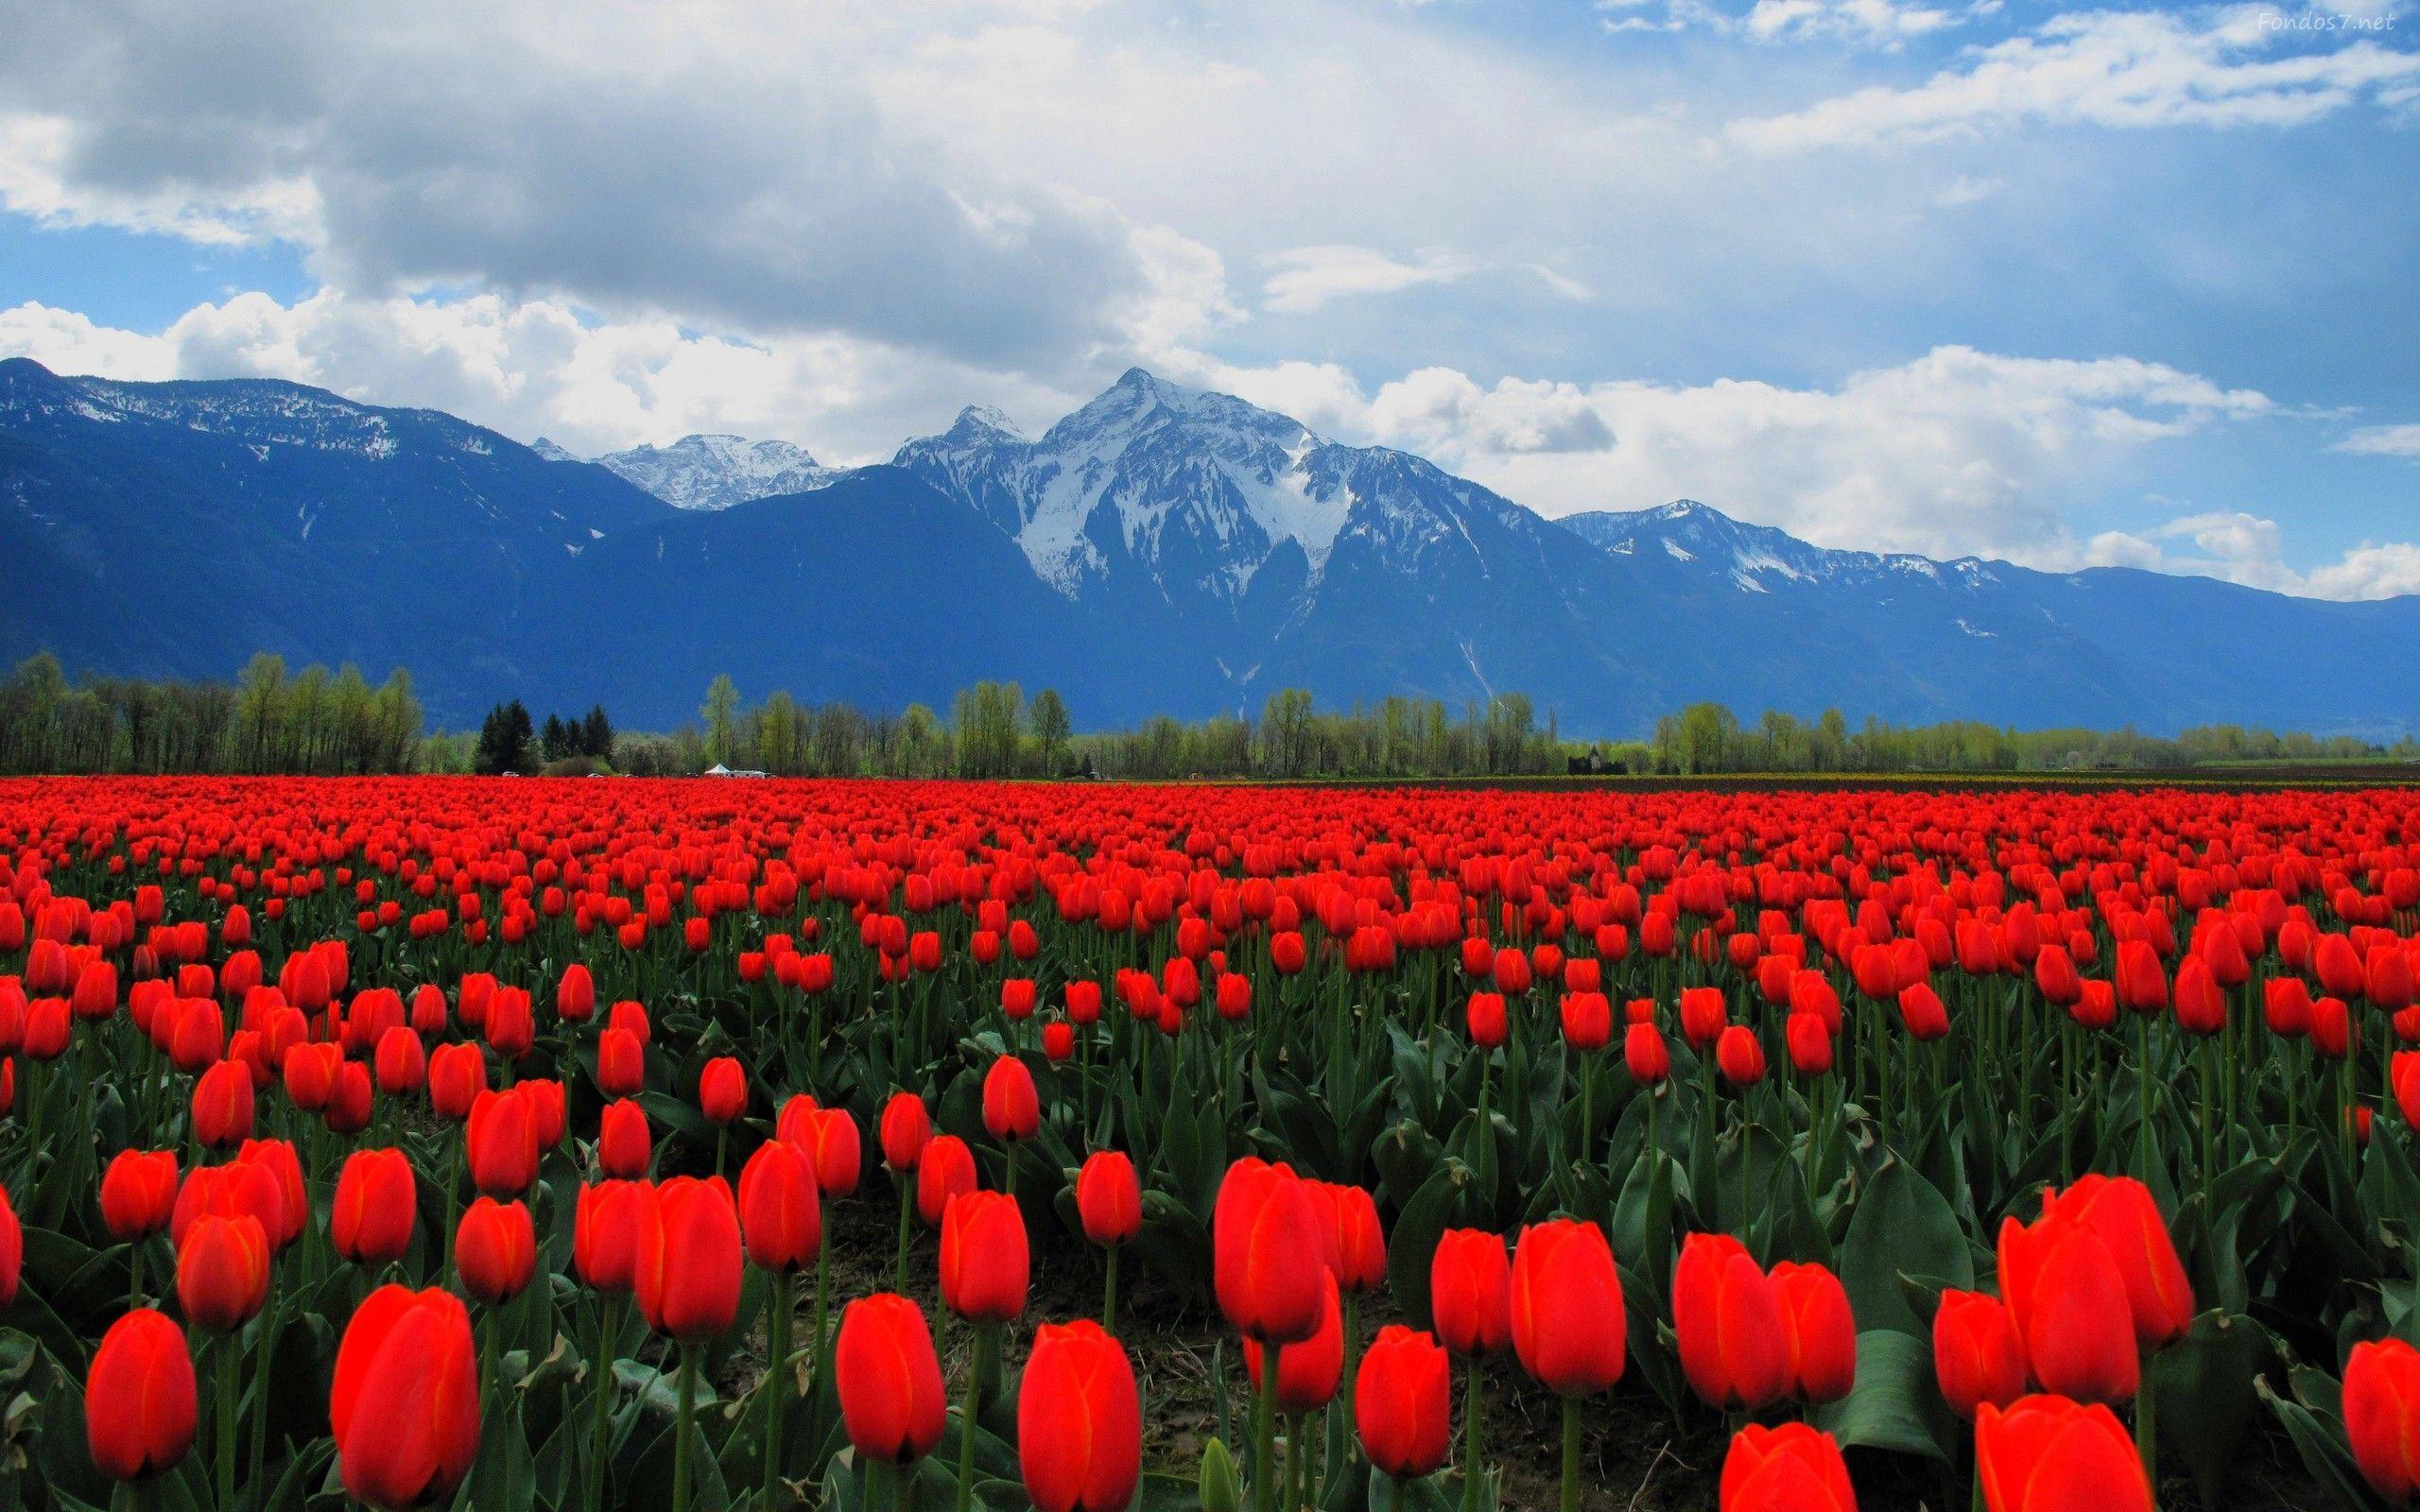 Wallpapers Rosas Rojas: Rosas Rojas Jardin De Tulipanes Hd Widescreen Gratis